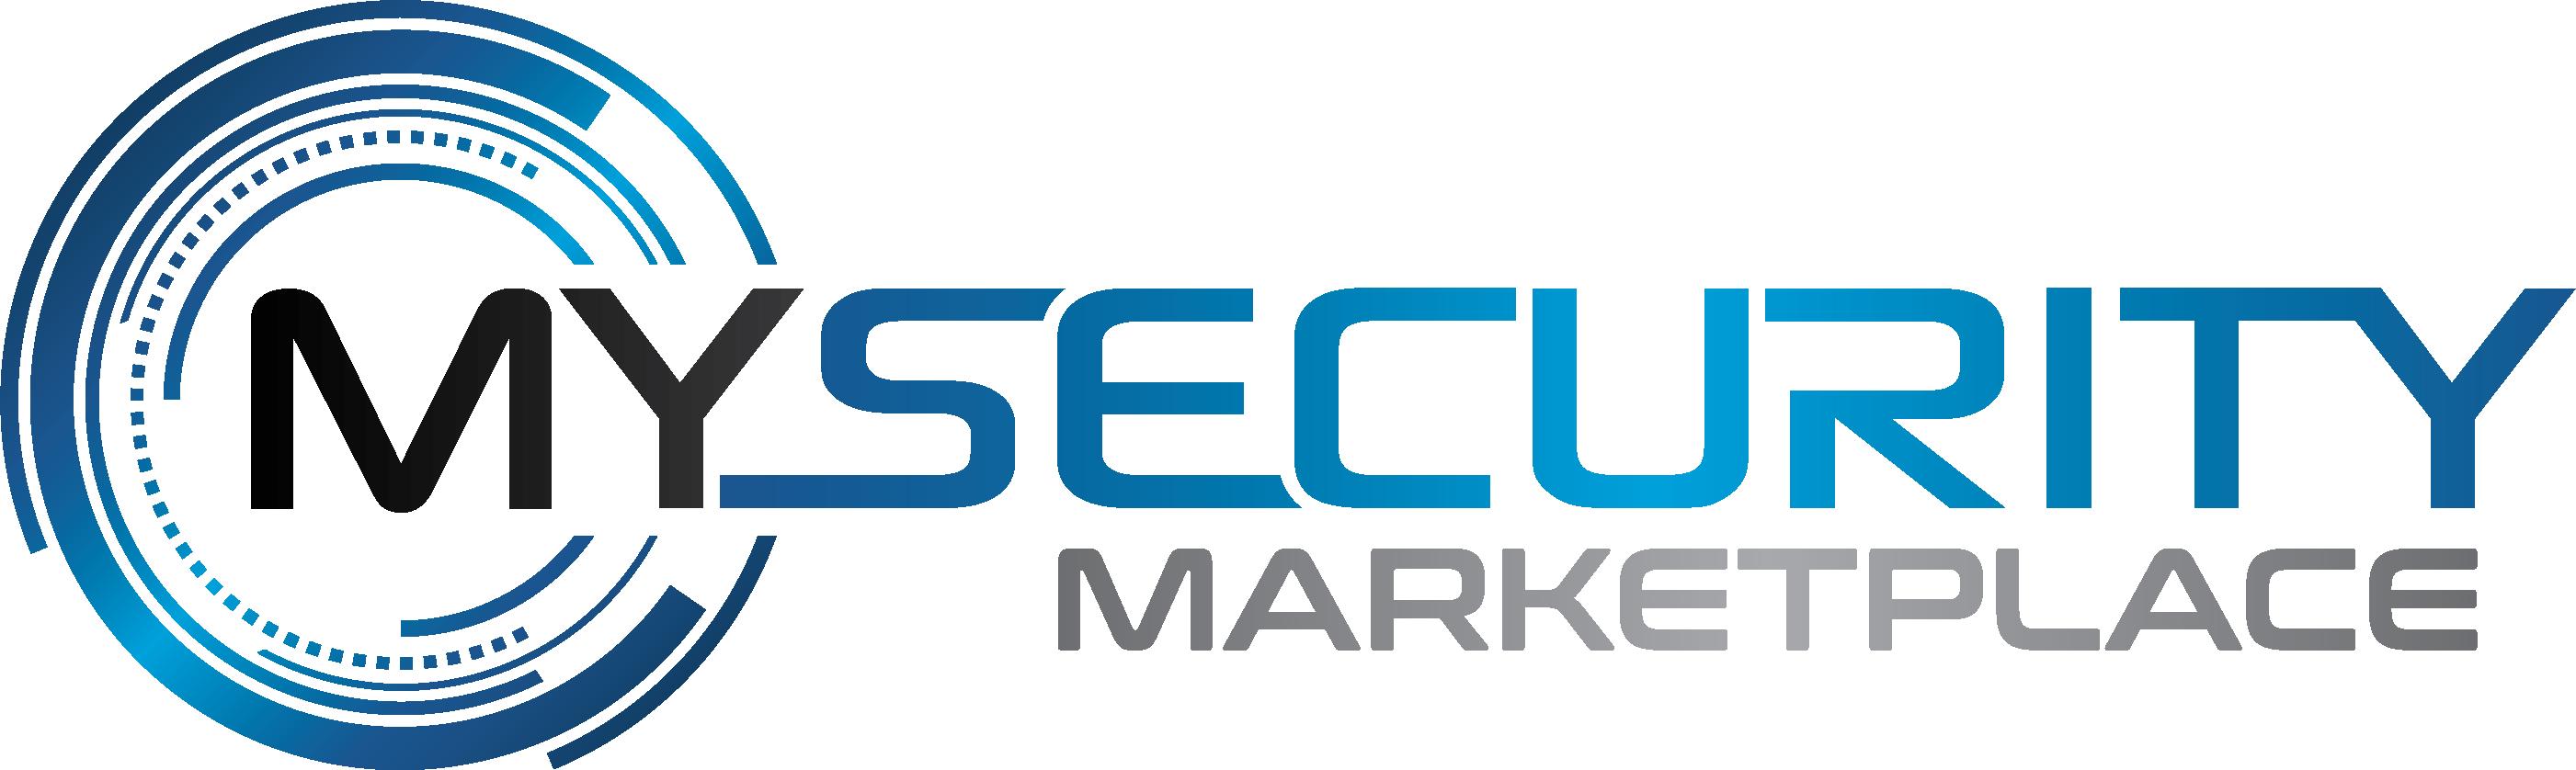 MySecurityMedia_Marketplace-1